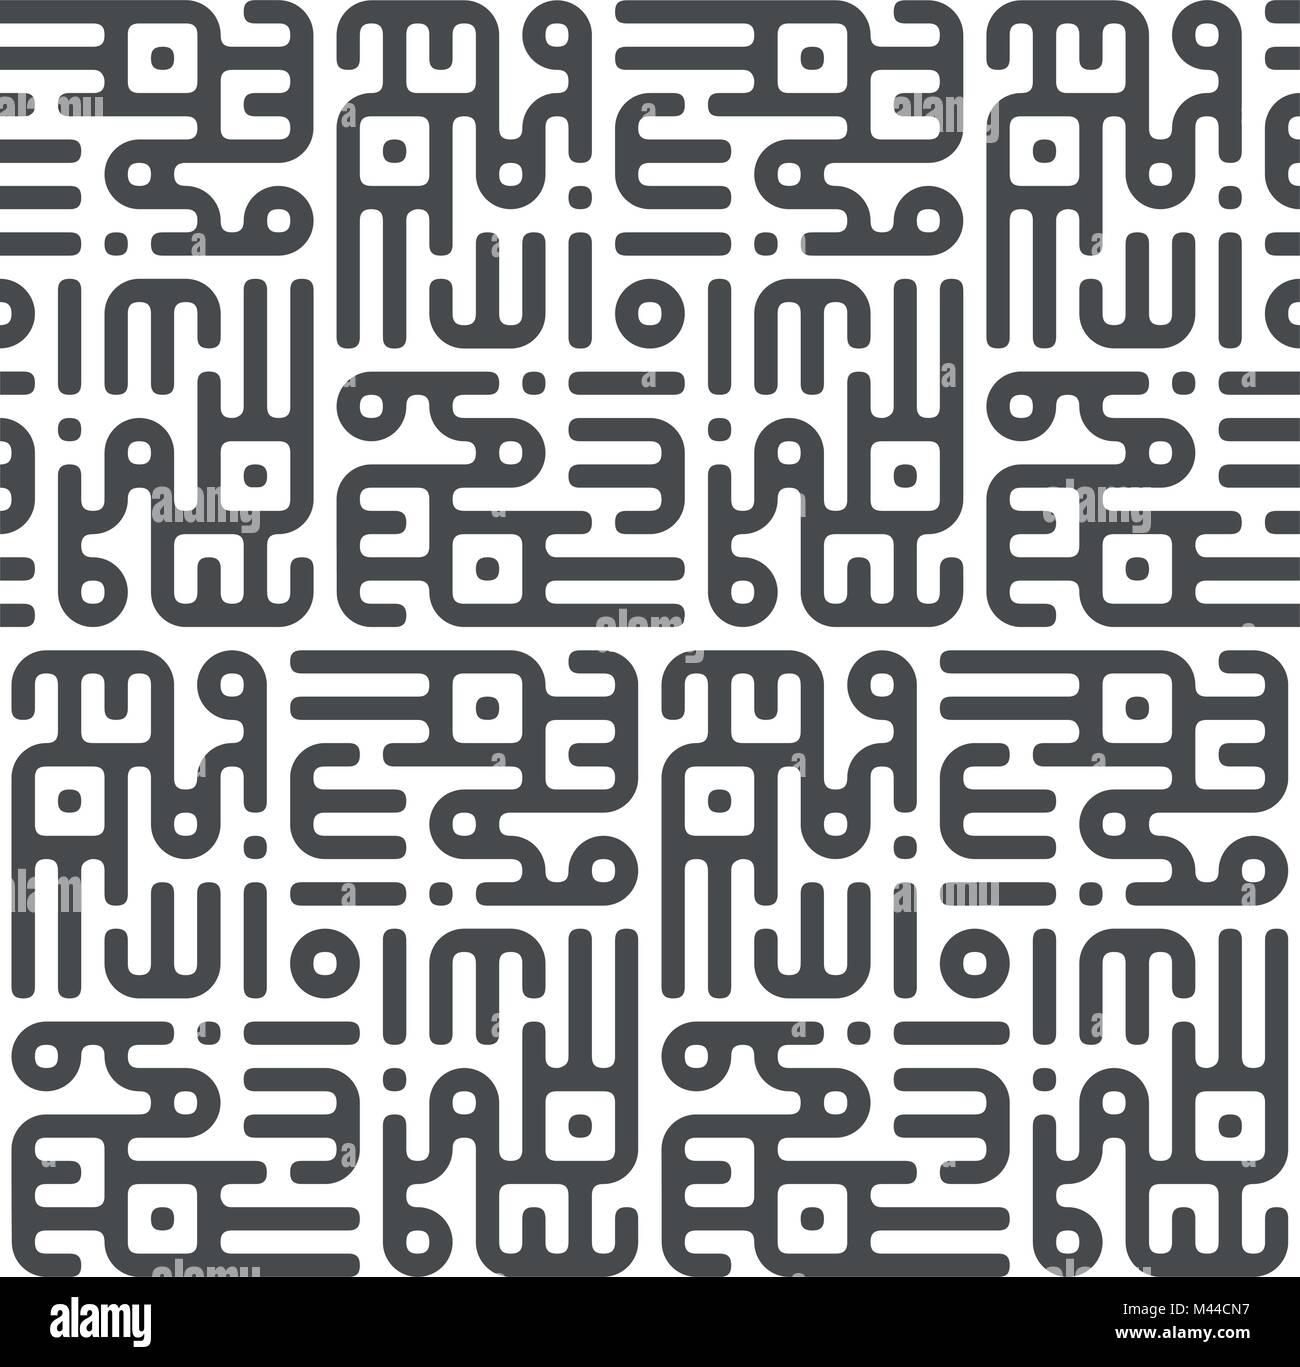 Geometric Kufic Script Stock Photos & Geometric Kufic Script